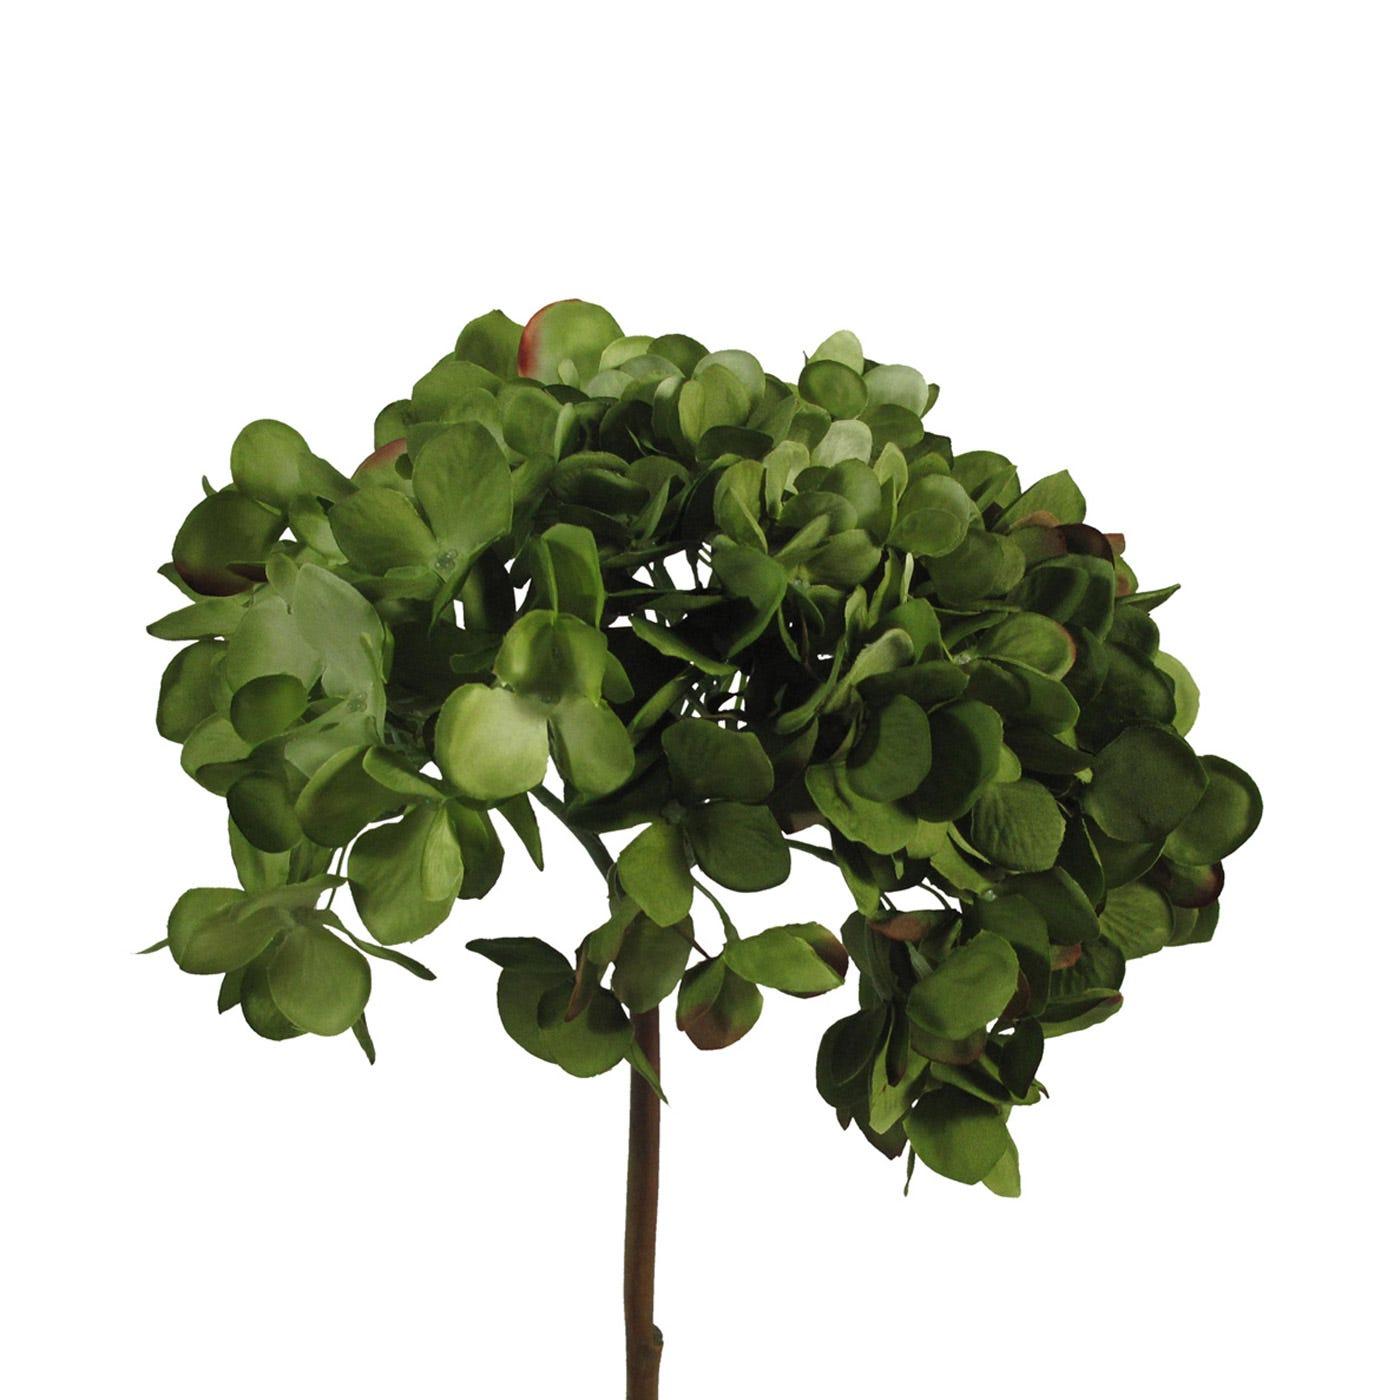 Hydrangea Green Stem